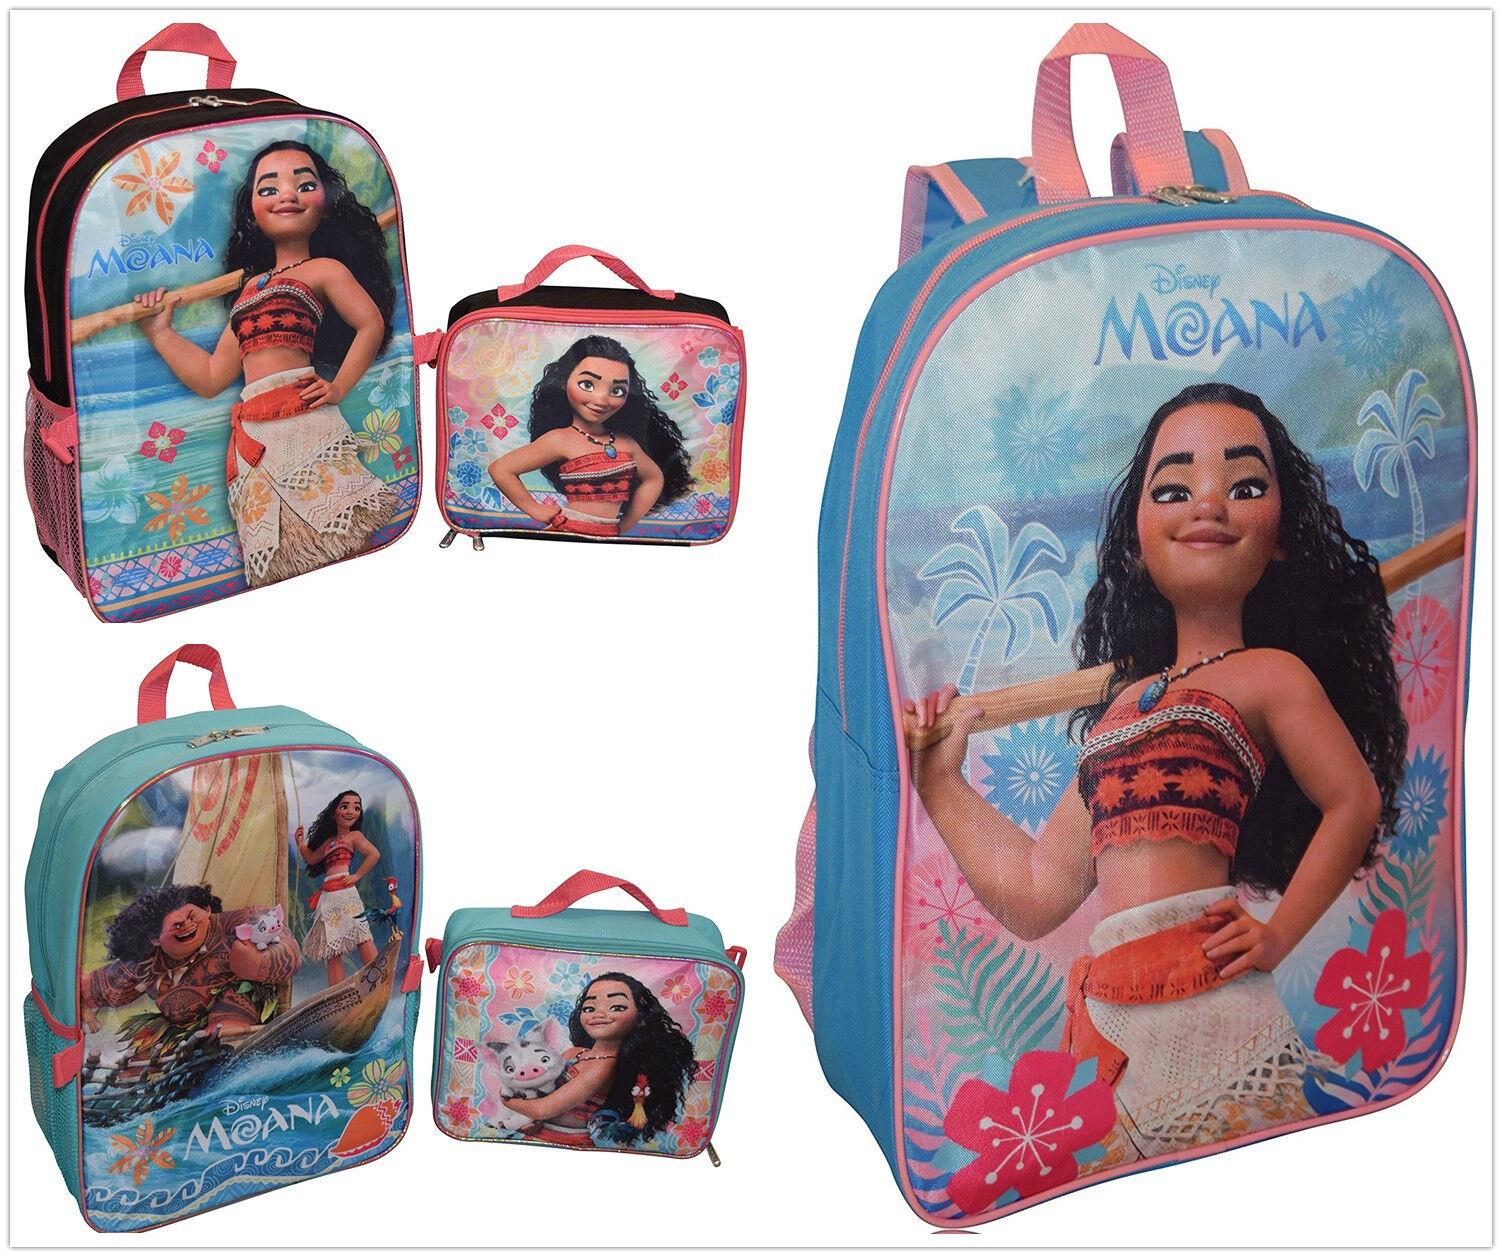 Disney Princess Moana School Backpack Bookbag Lunch box Set